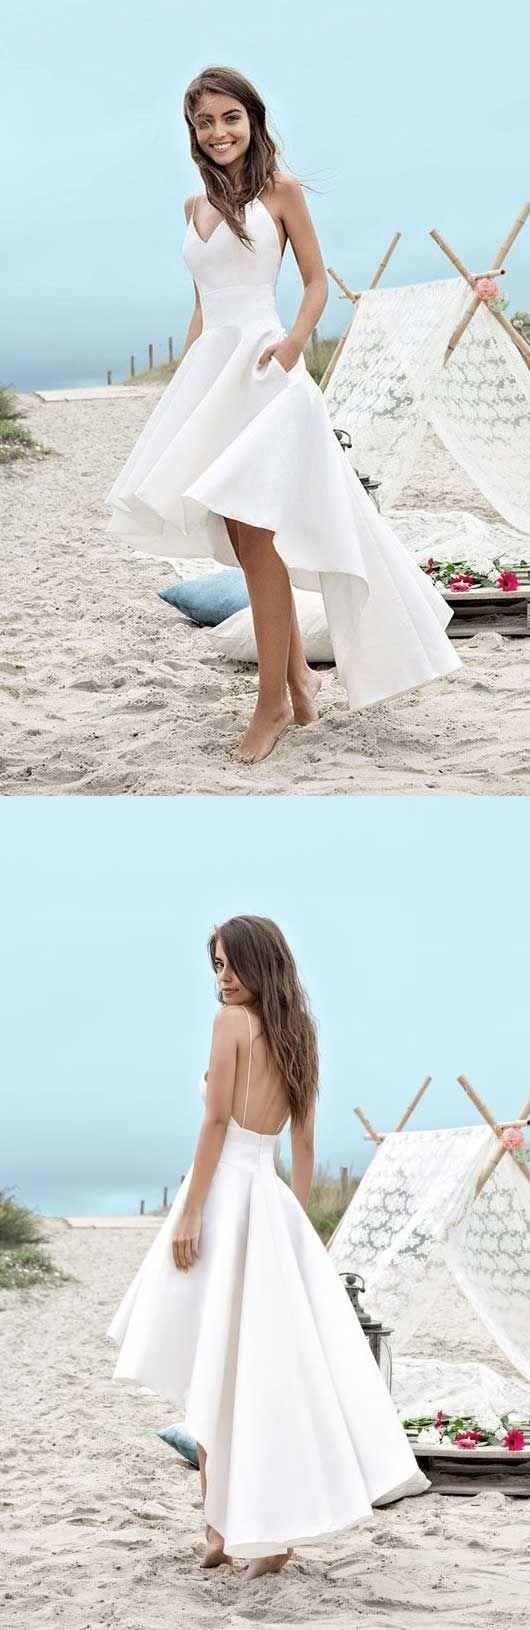 555 best Wedding Dresses images on Pinterest